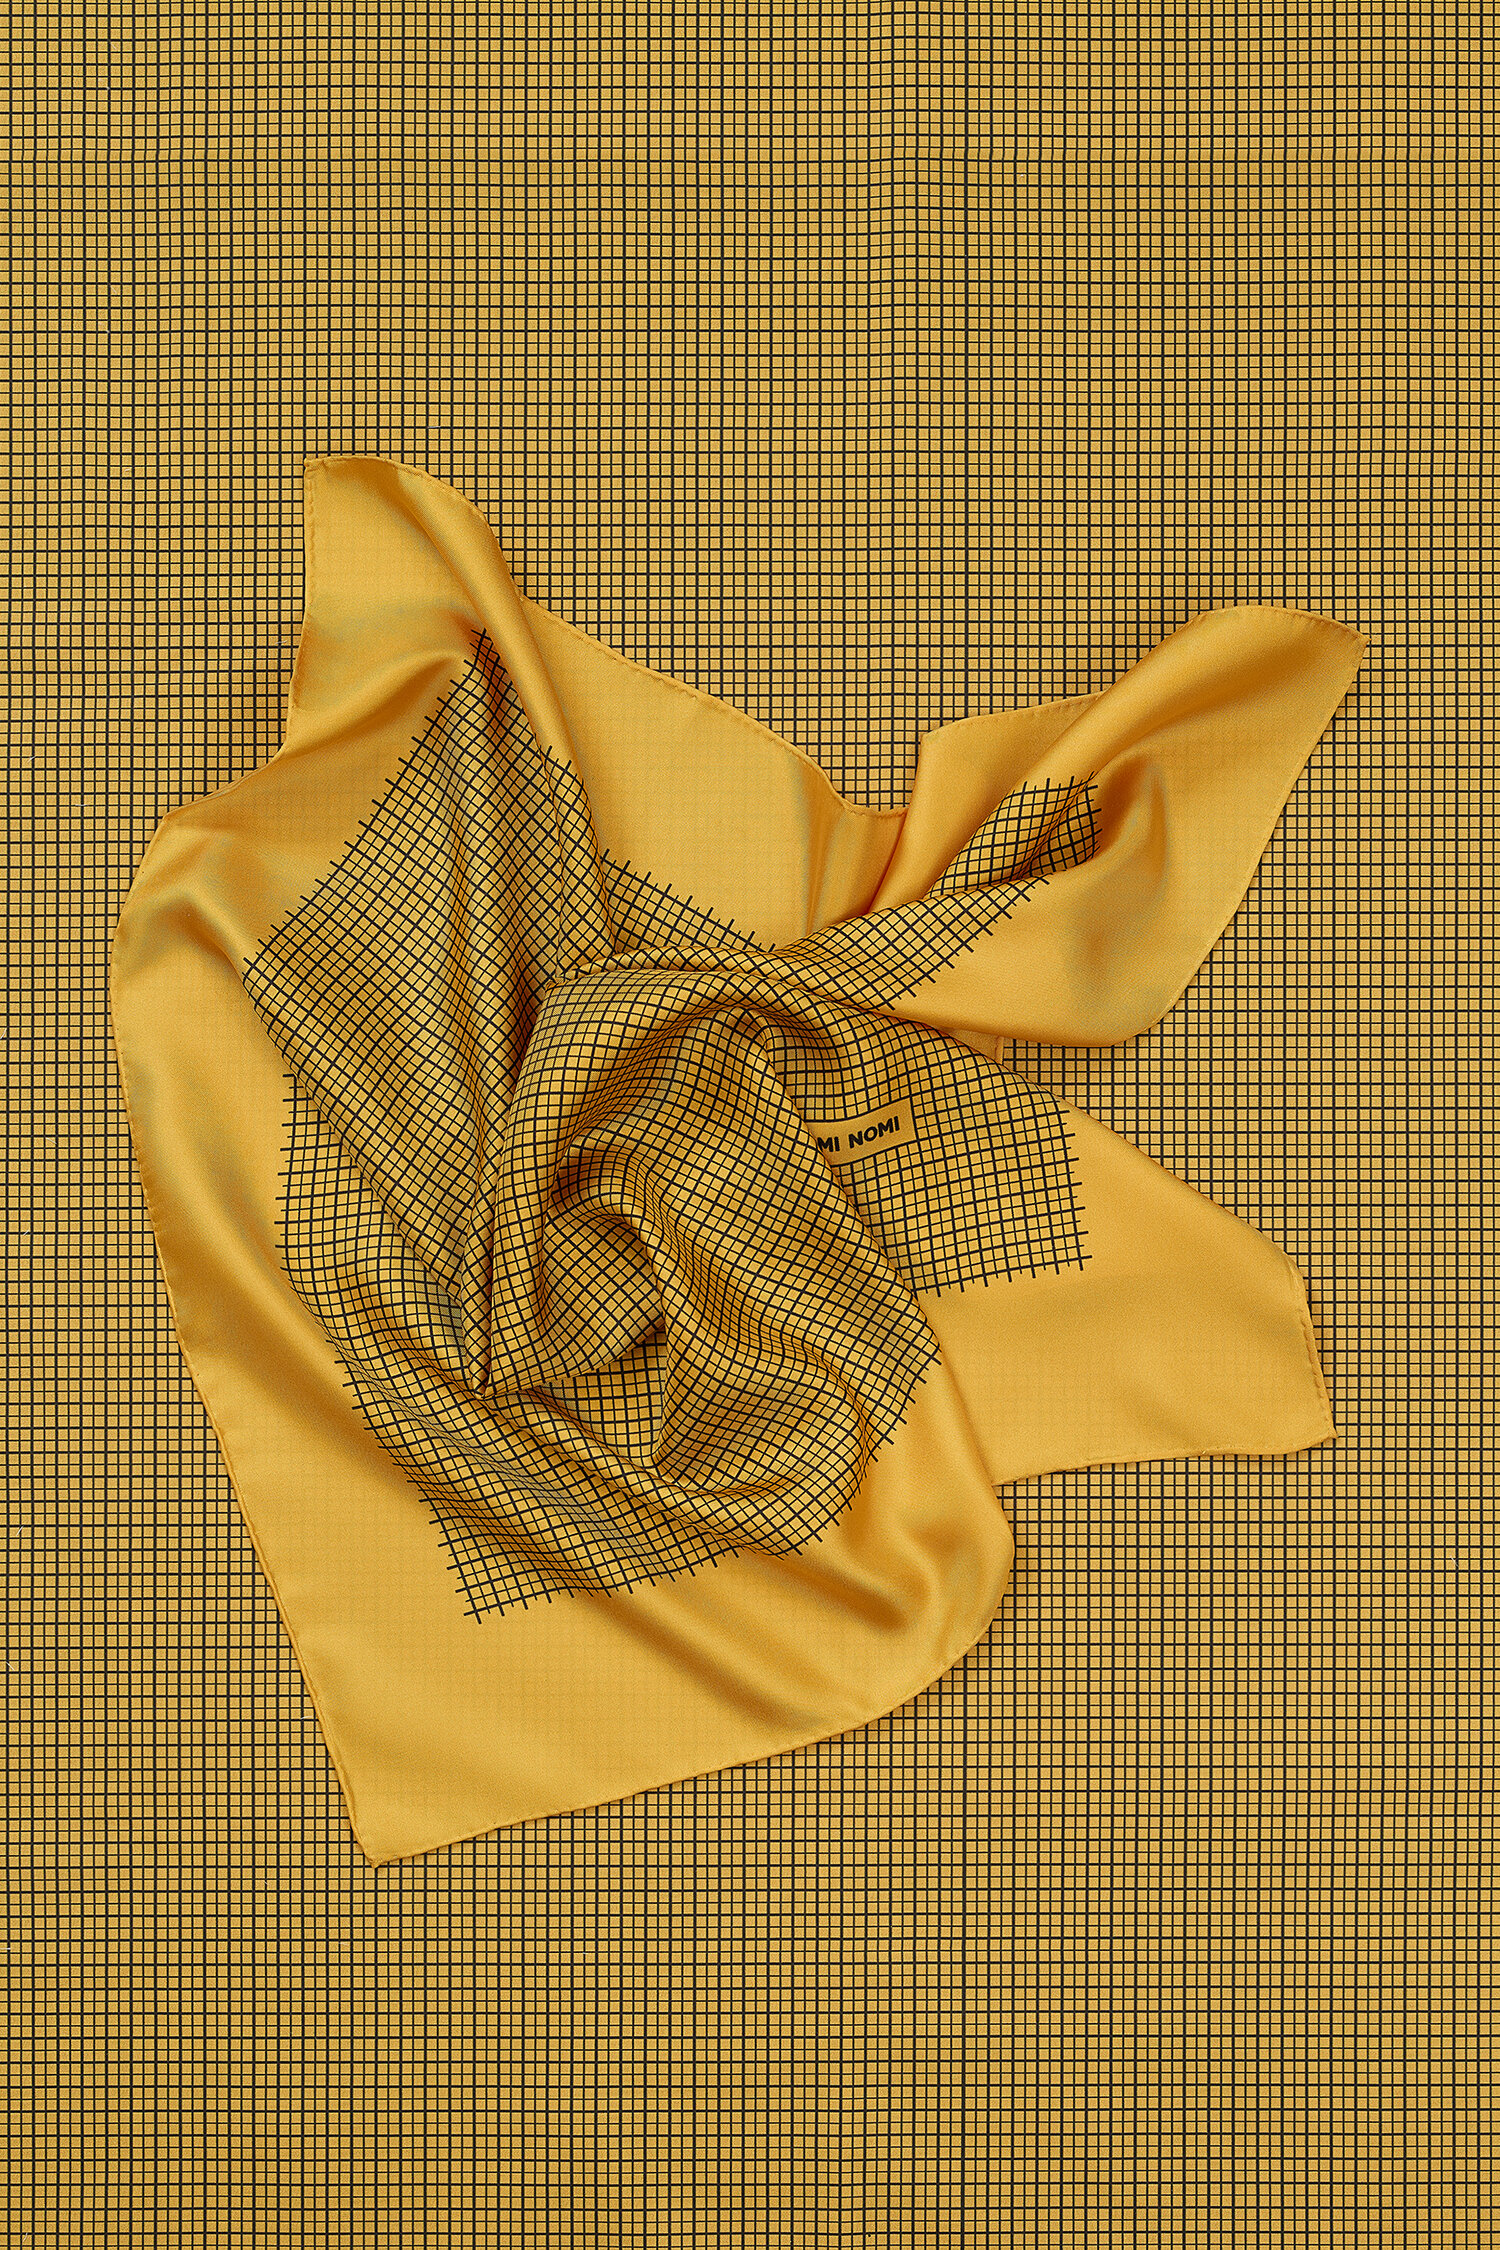 ROMER_NMishkin_2019Scarves-Yellow_021419-_405_Edit_Ext_Web.jpg